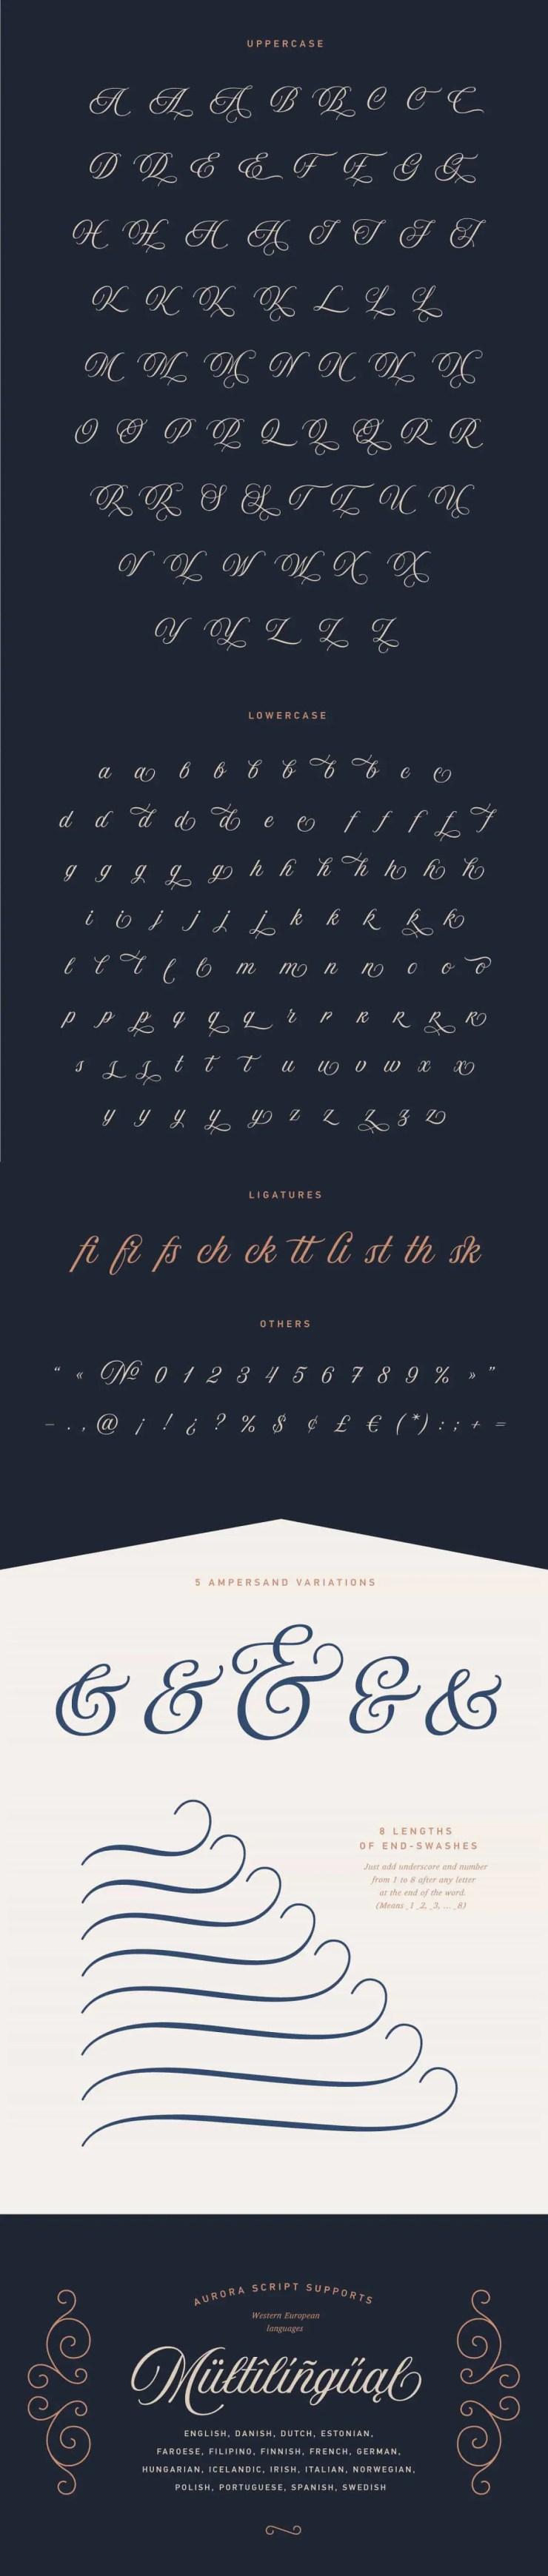 Aurora Script by Andrey Sharonov Full